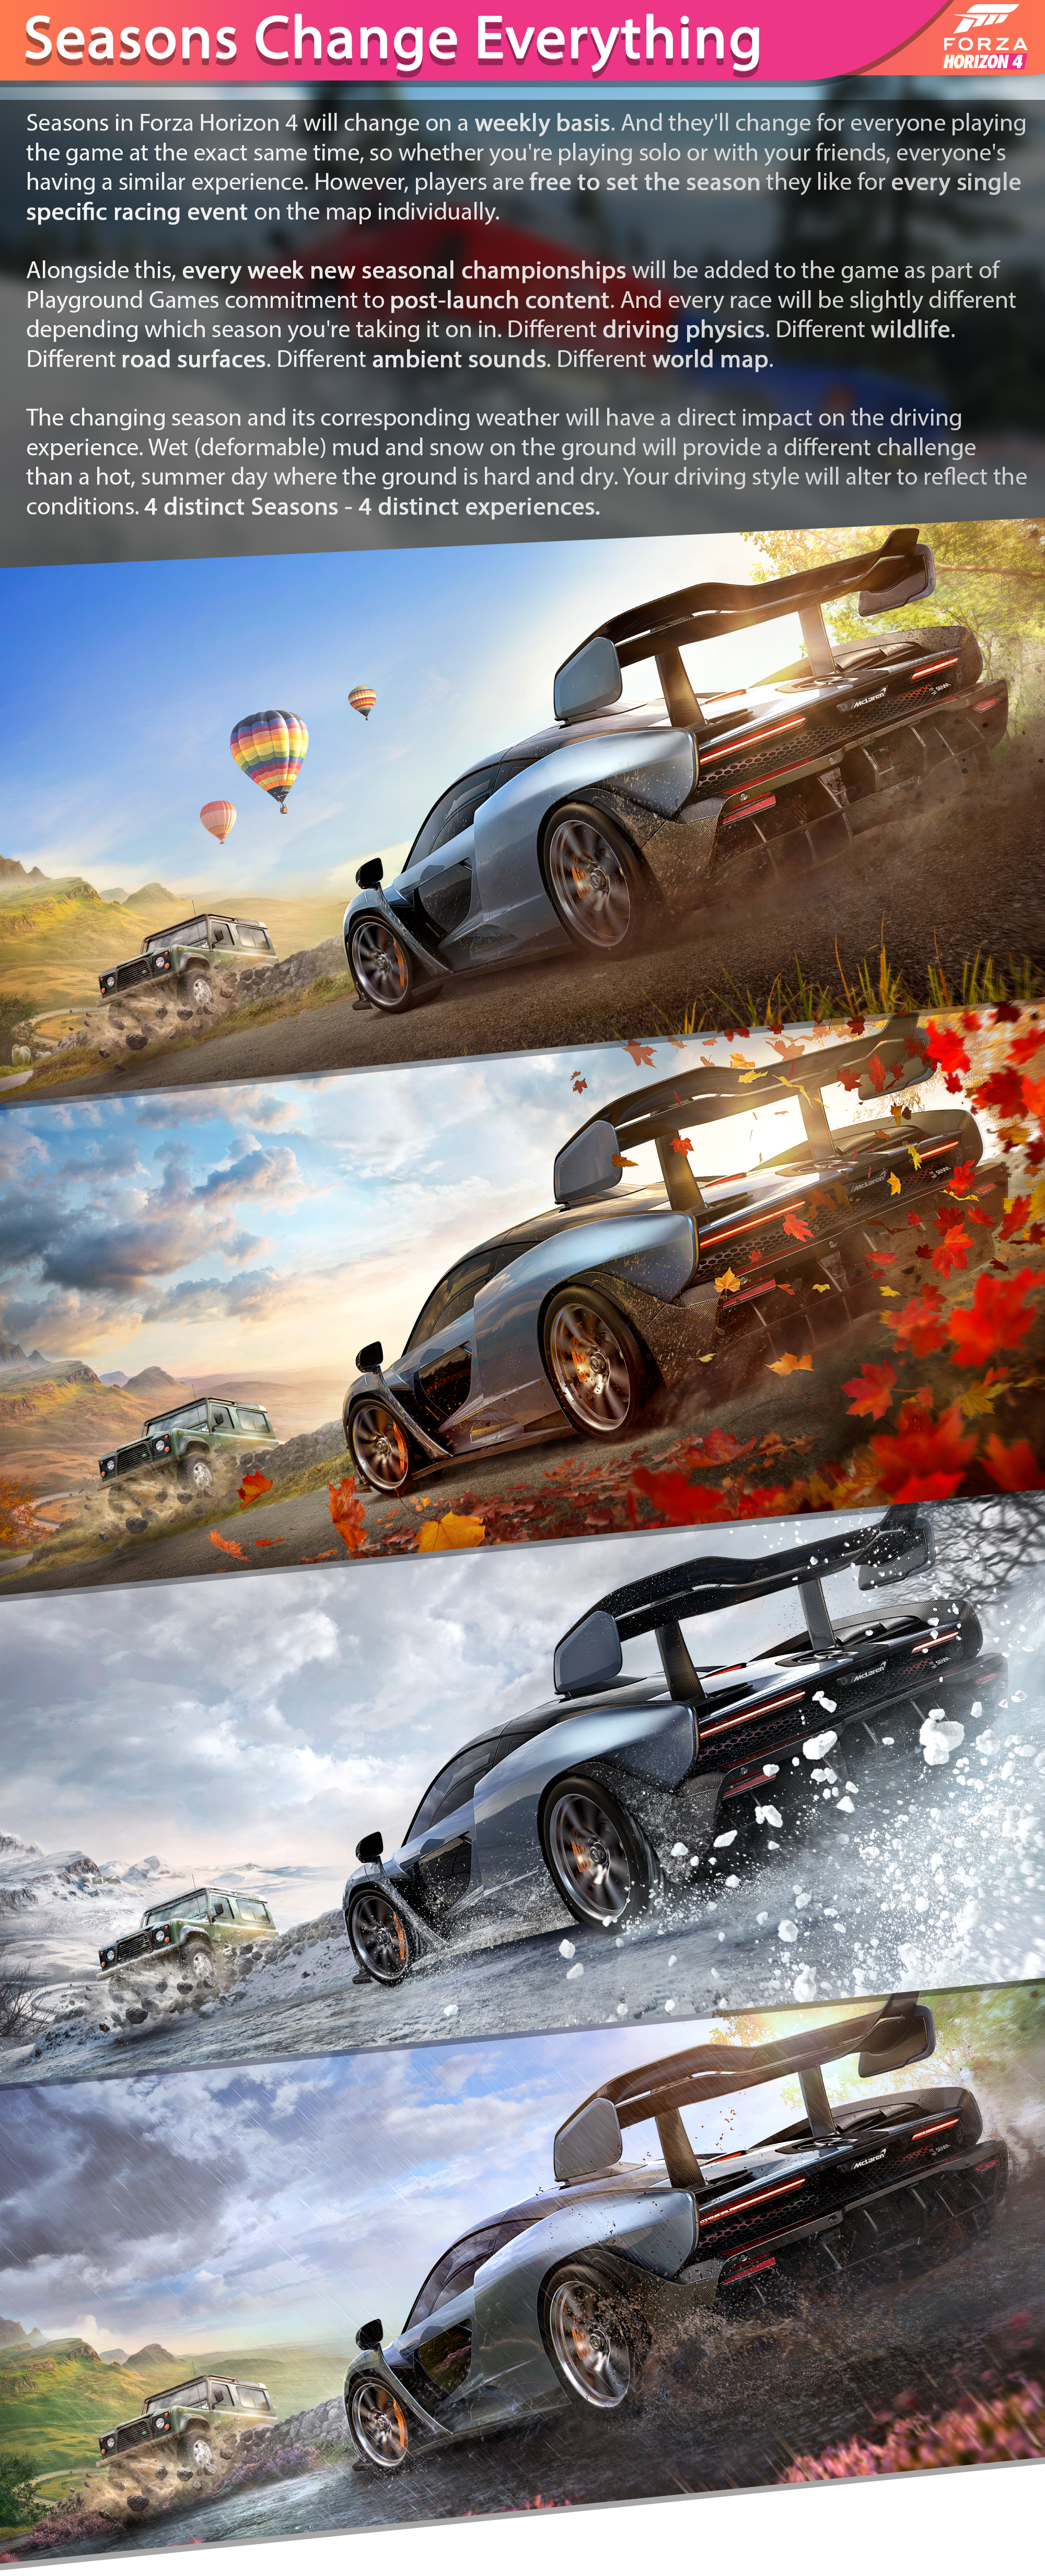 Forza Horizon 4 |OT| Seasoned to Perfection | ResetEra